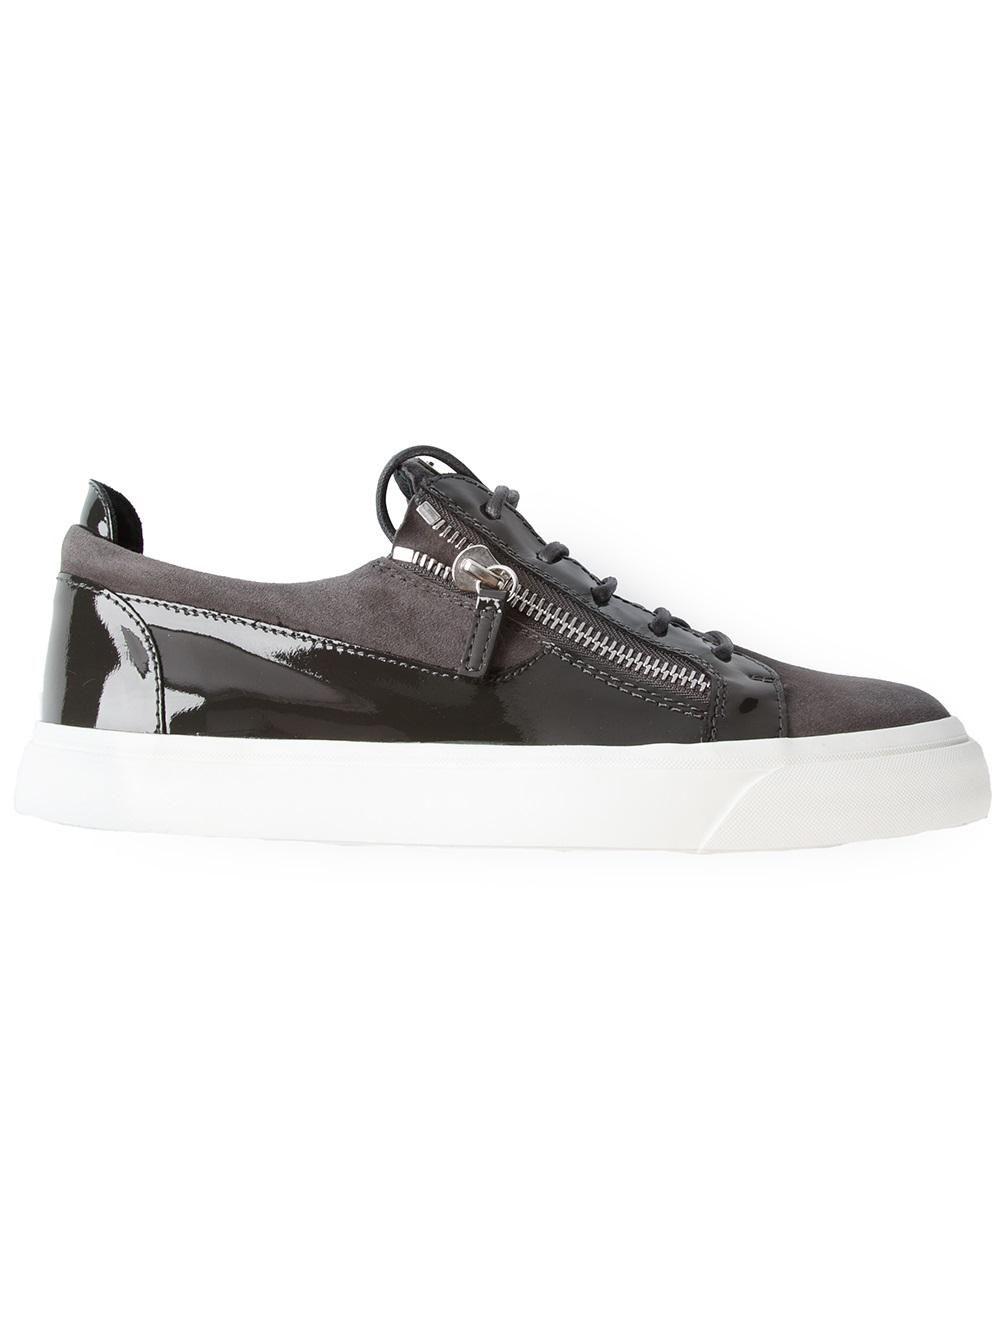 2c19156da456 Shop Giuseppe Zanotti Design zip detail sneaker from Farfetch ...